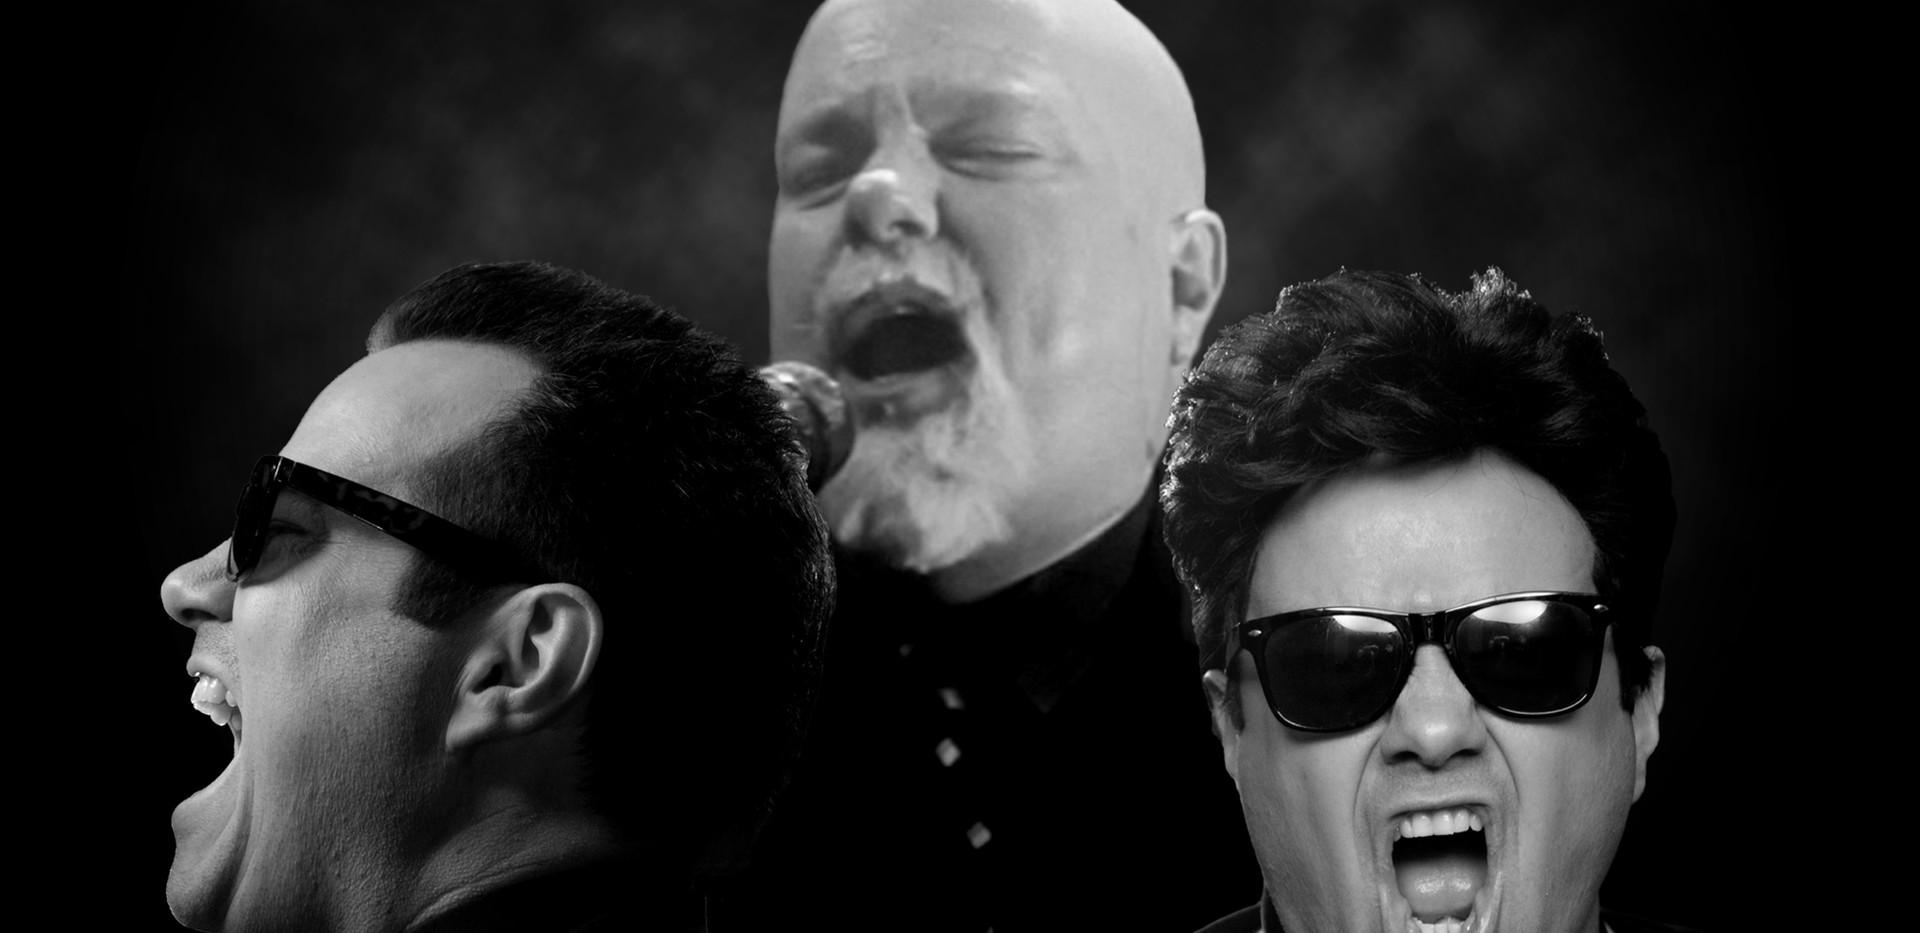 Billy Joel Tribute UK 02.jpg